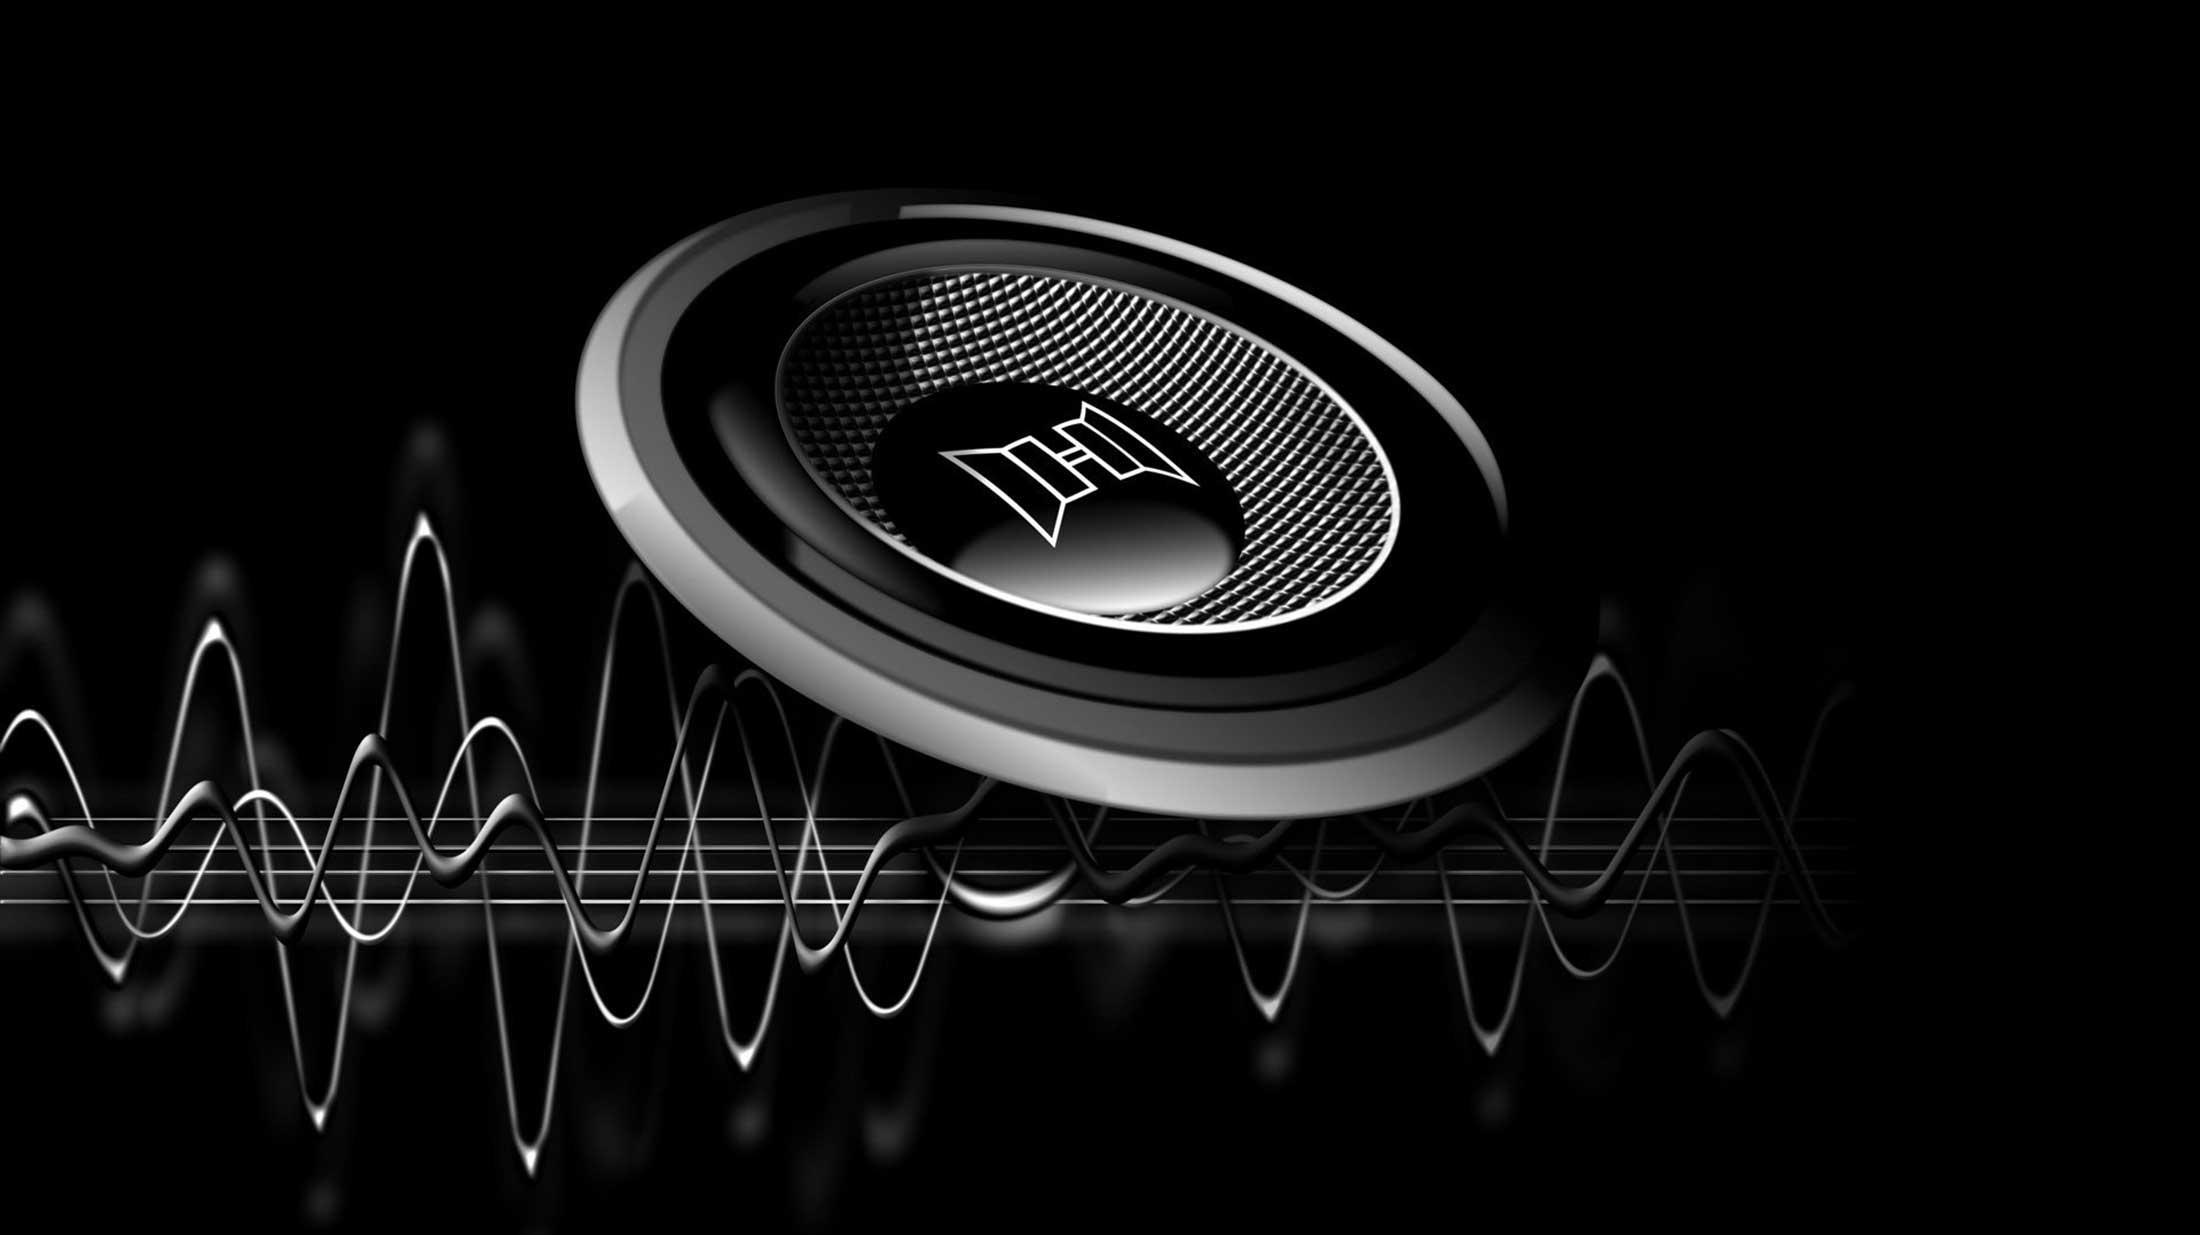 Transmite en vivo con tu Radio Online